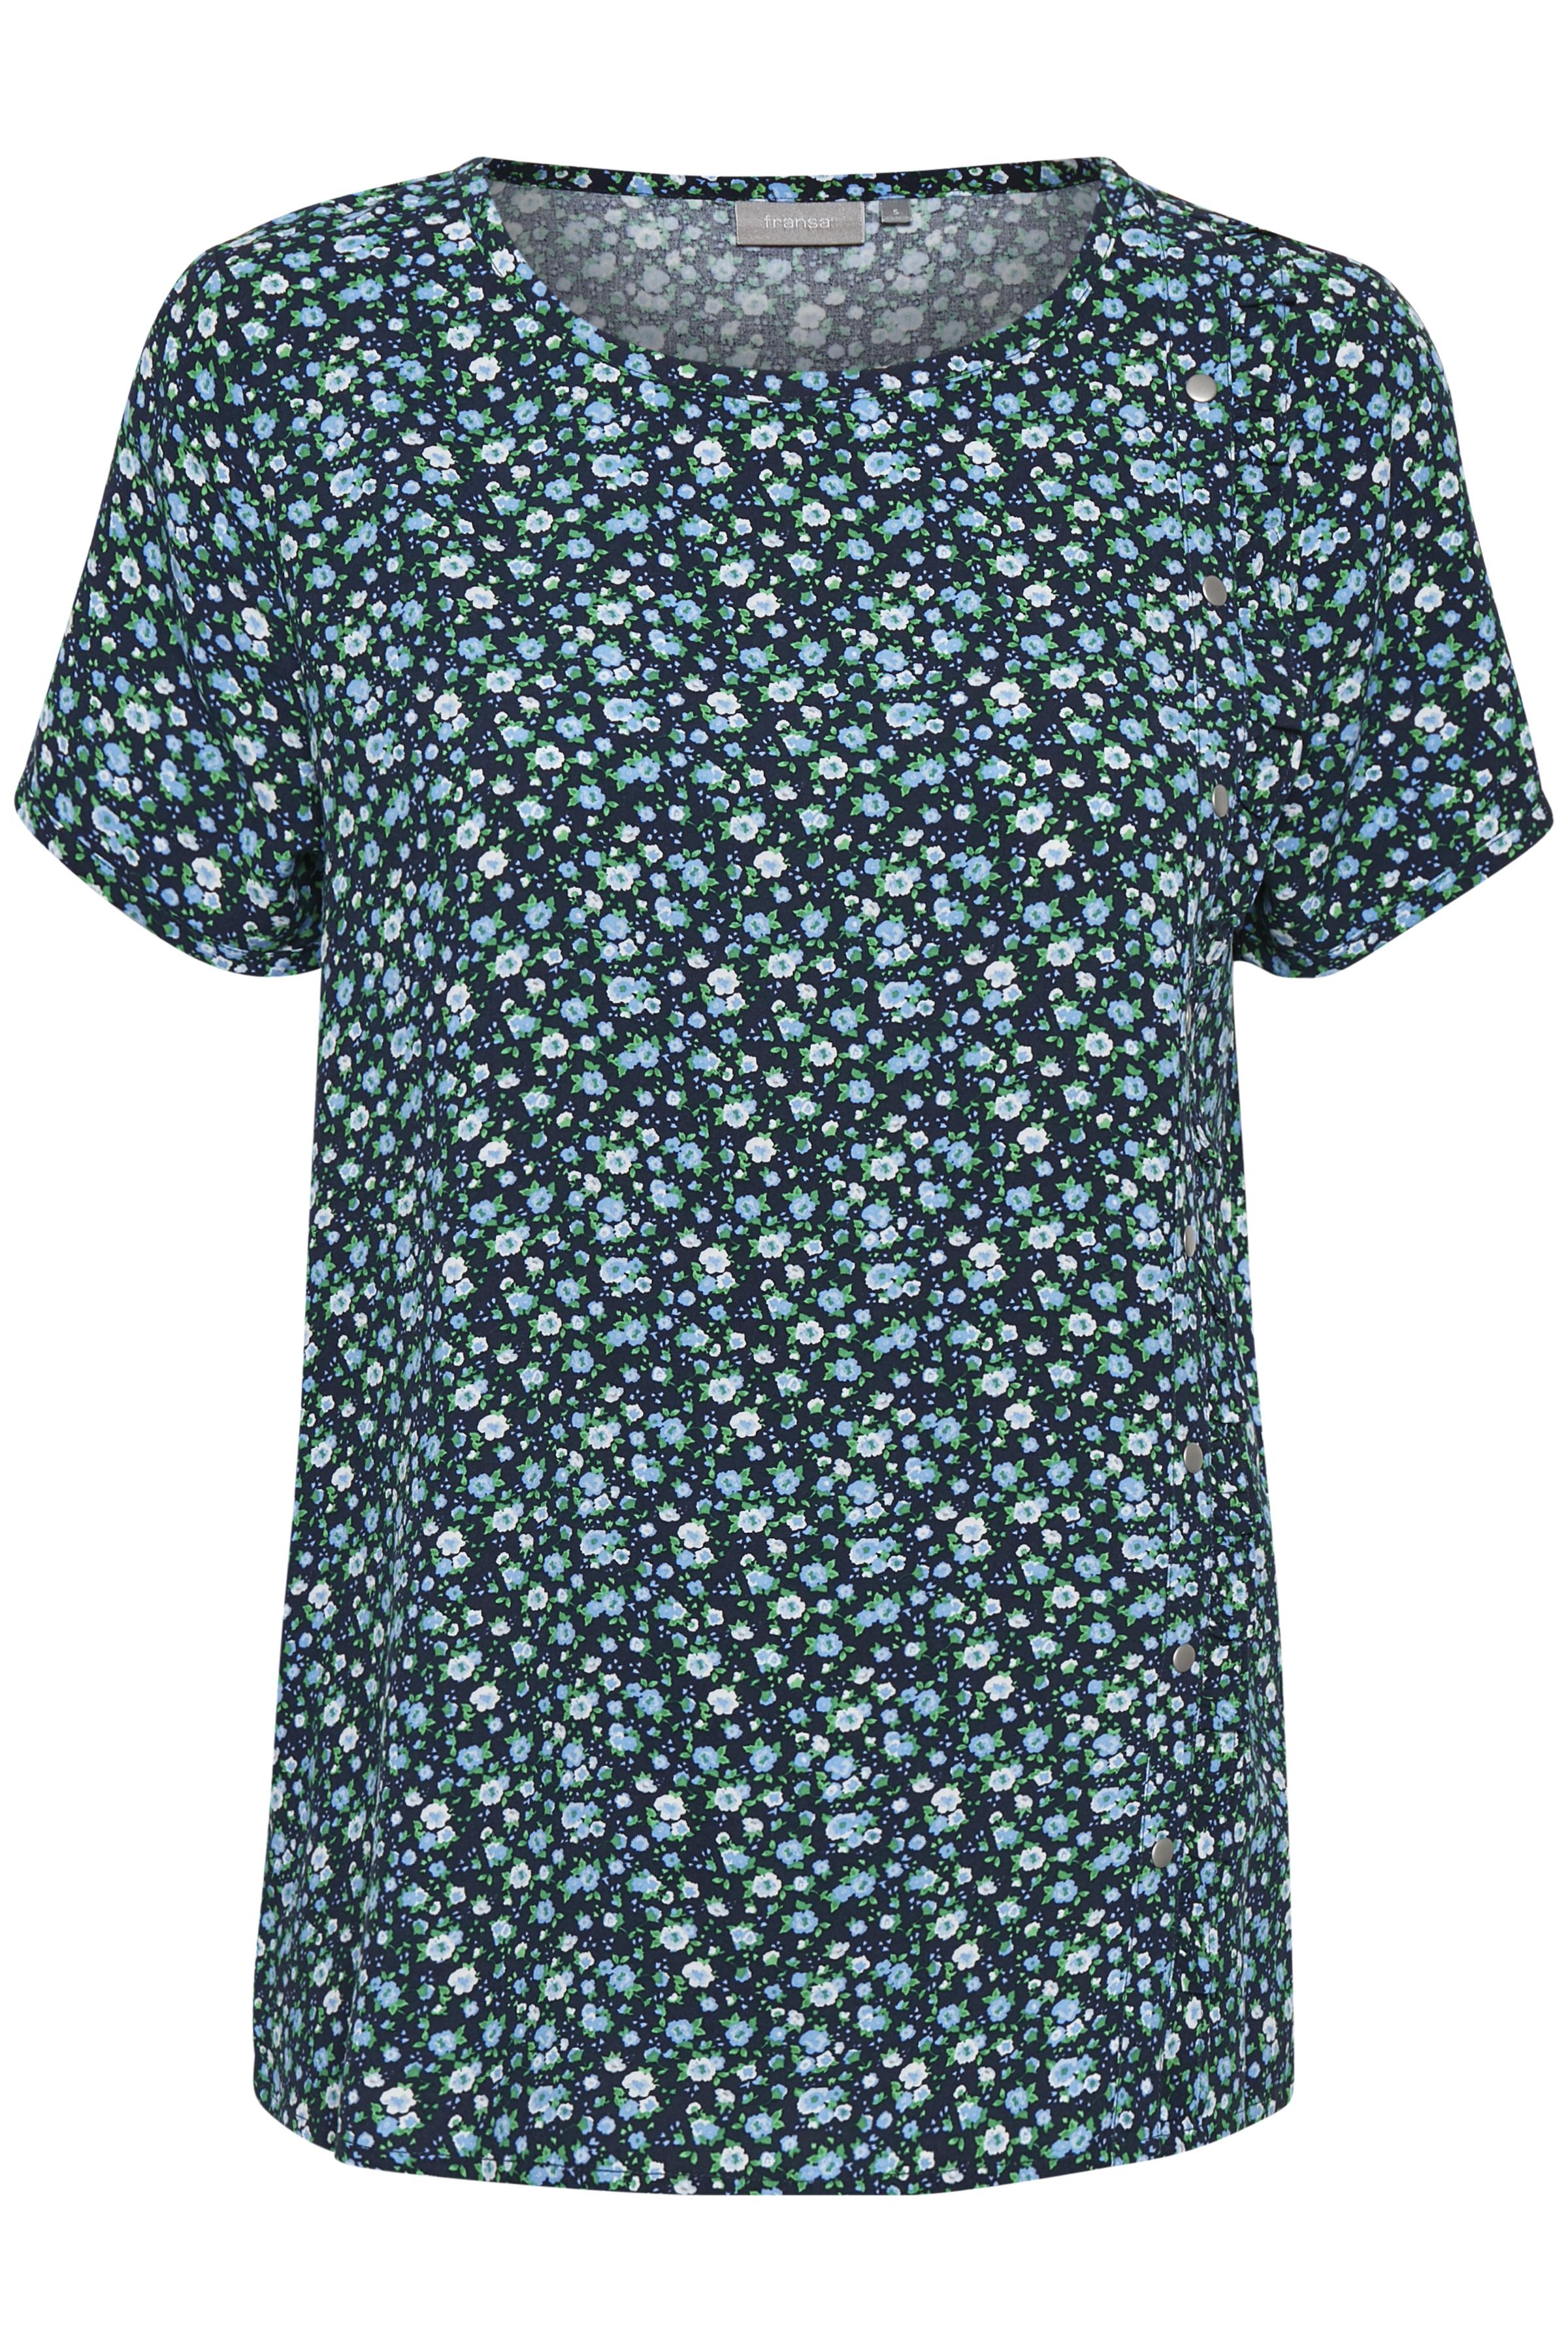 Marineblauw/blauw Korte mouwen shirt  van Fransa – Door Marineblauw/blauw Korte mouwen shirt  van maat. XS-XXL hier